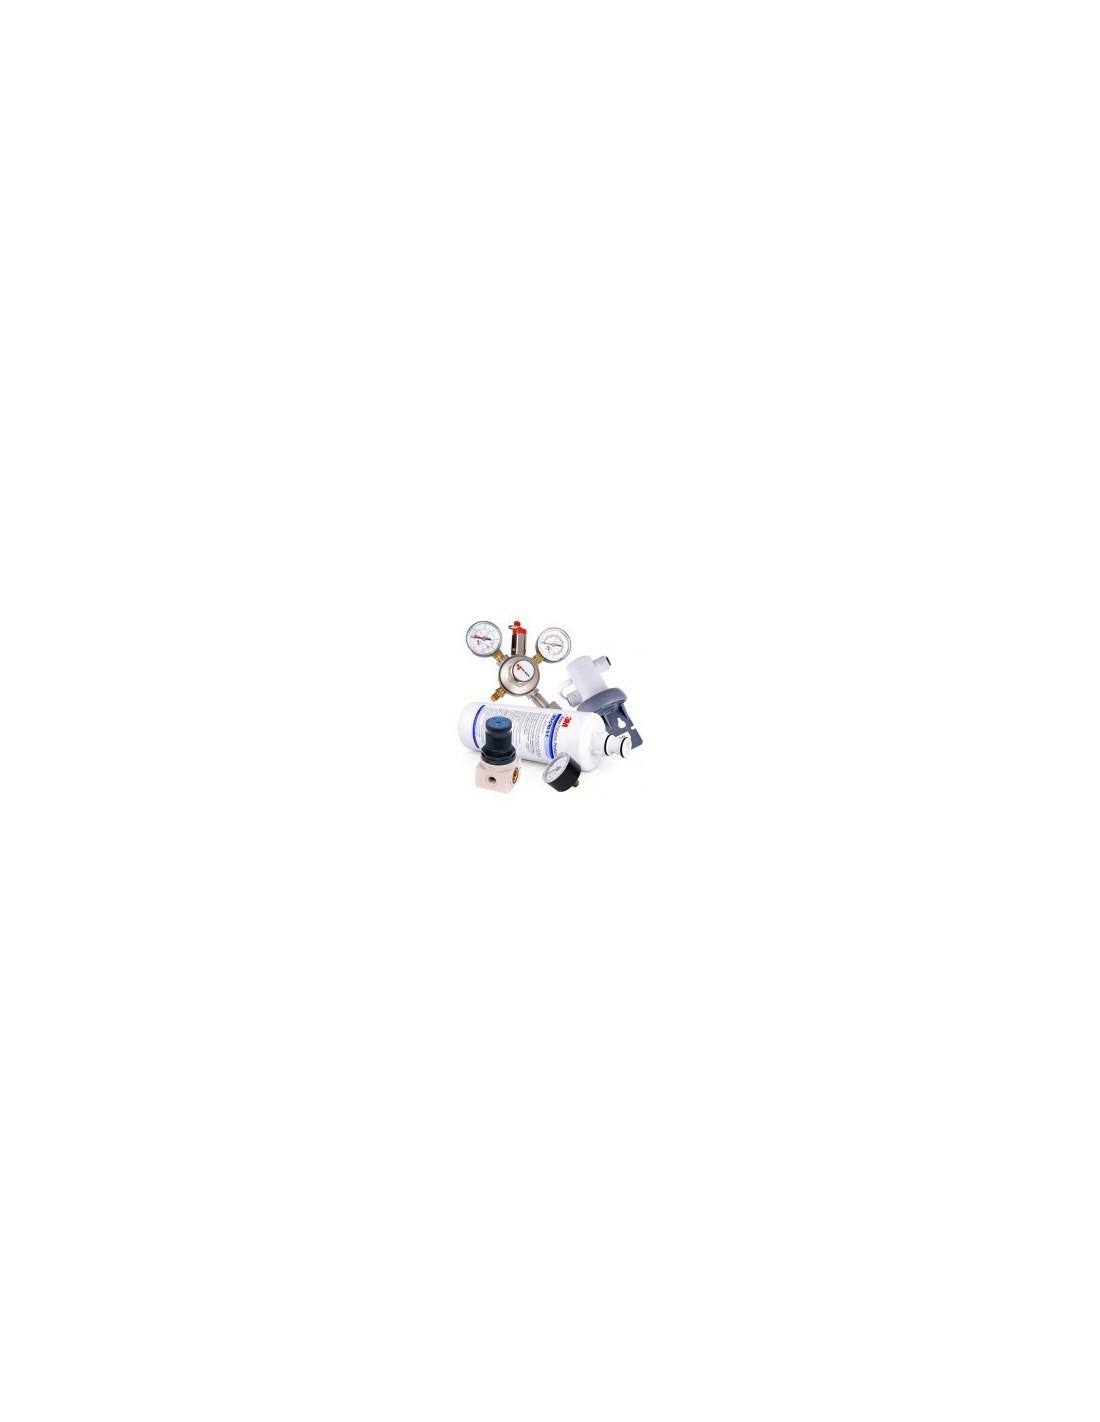 VYR02258_2 - Soda AS-110 accessory package